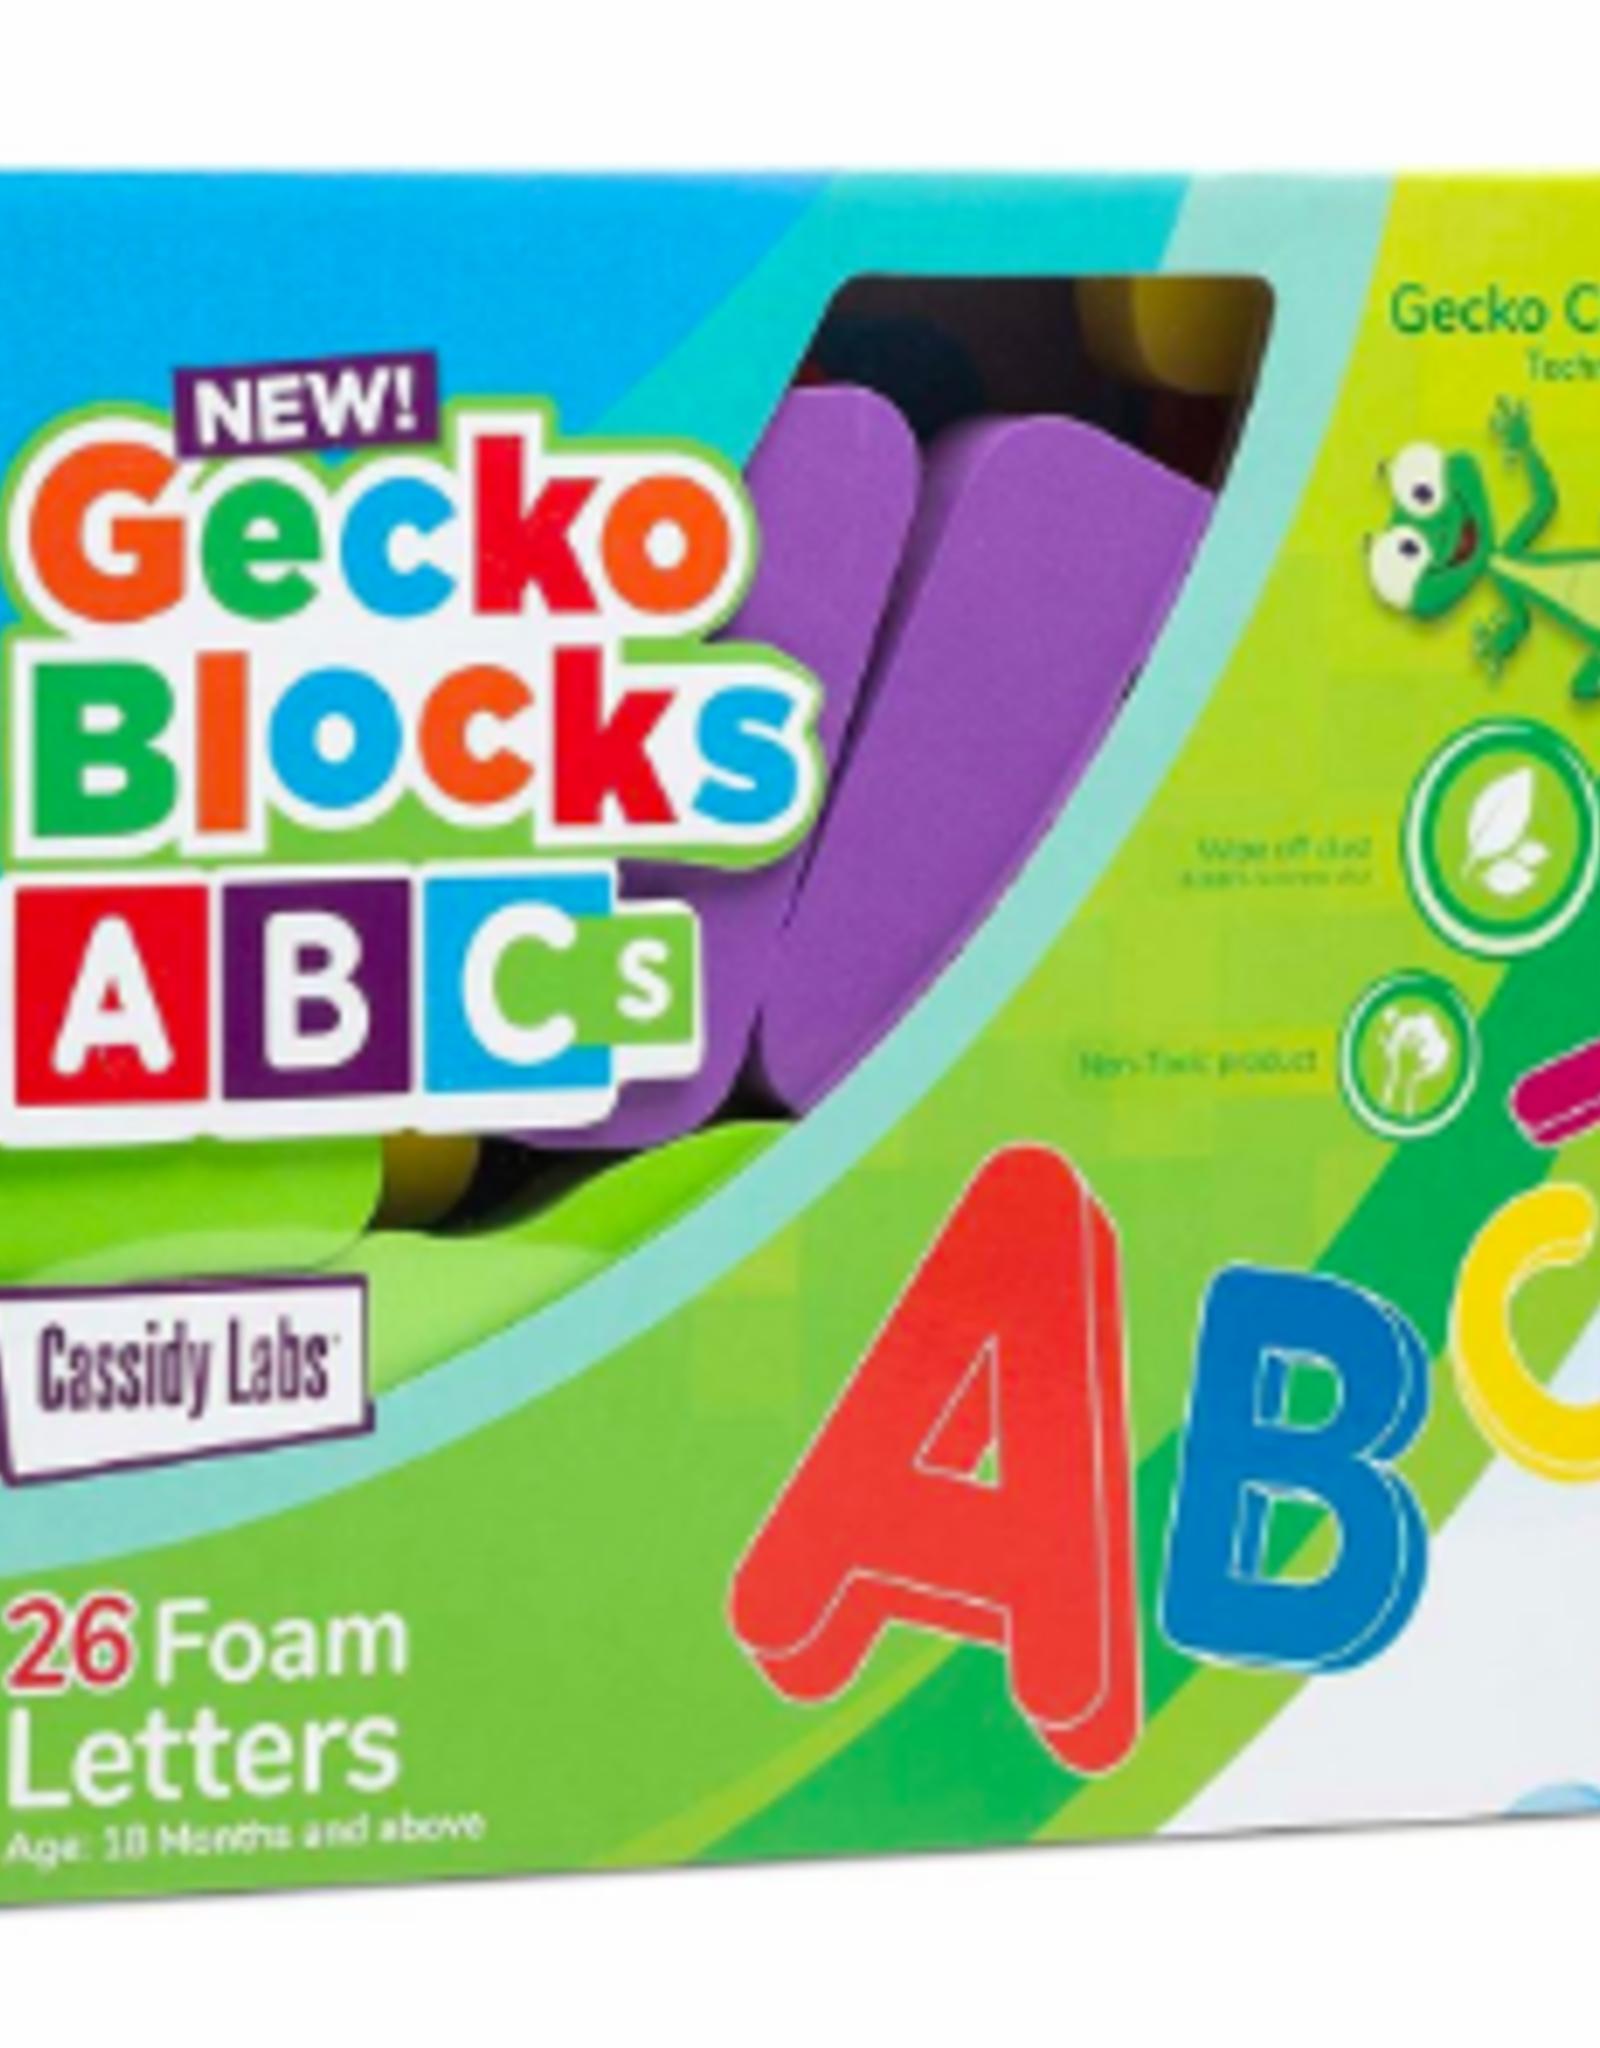 Cassidy Labs Gecko Block ABCs